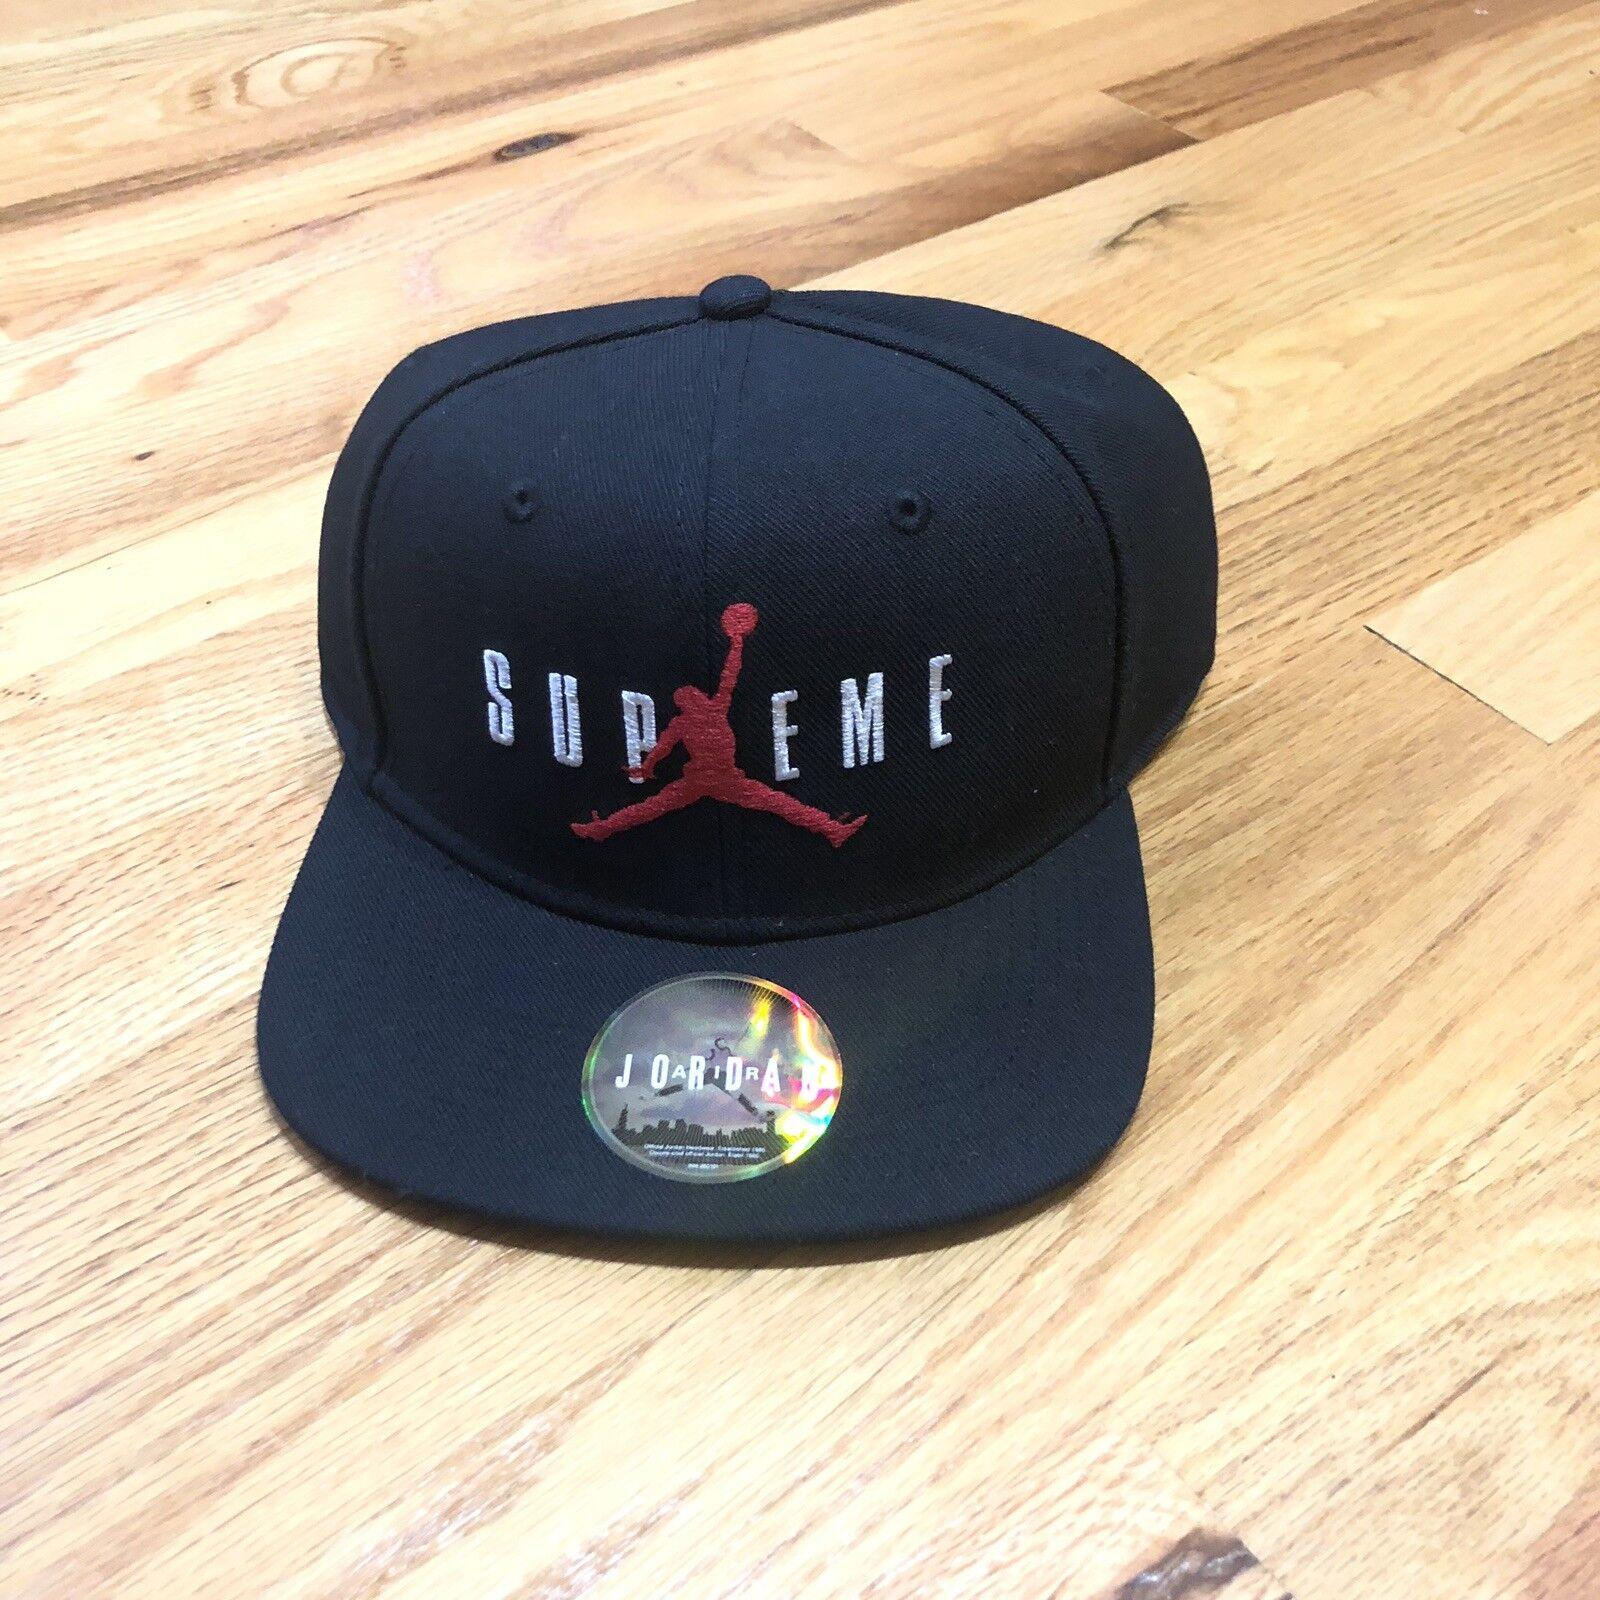 7fb4483337558 Supreme Nike Airmax 98 Running Hat Cap Black Dunk SB Jordan Yeezy for sale  online